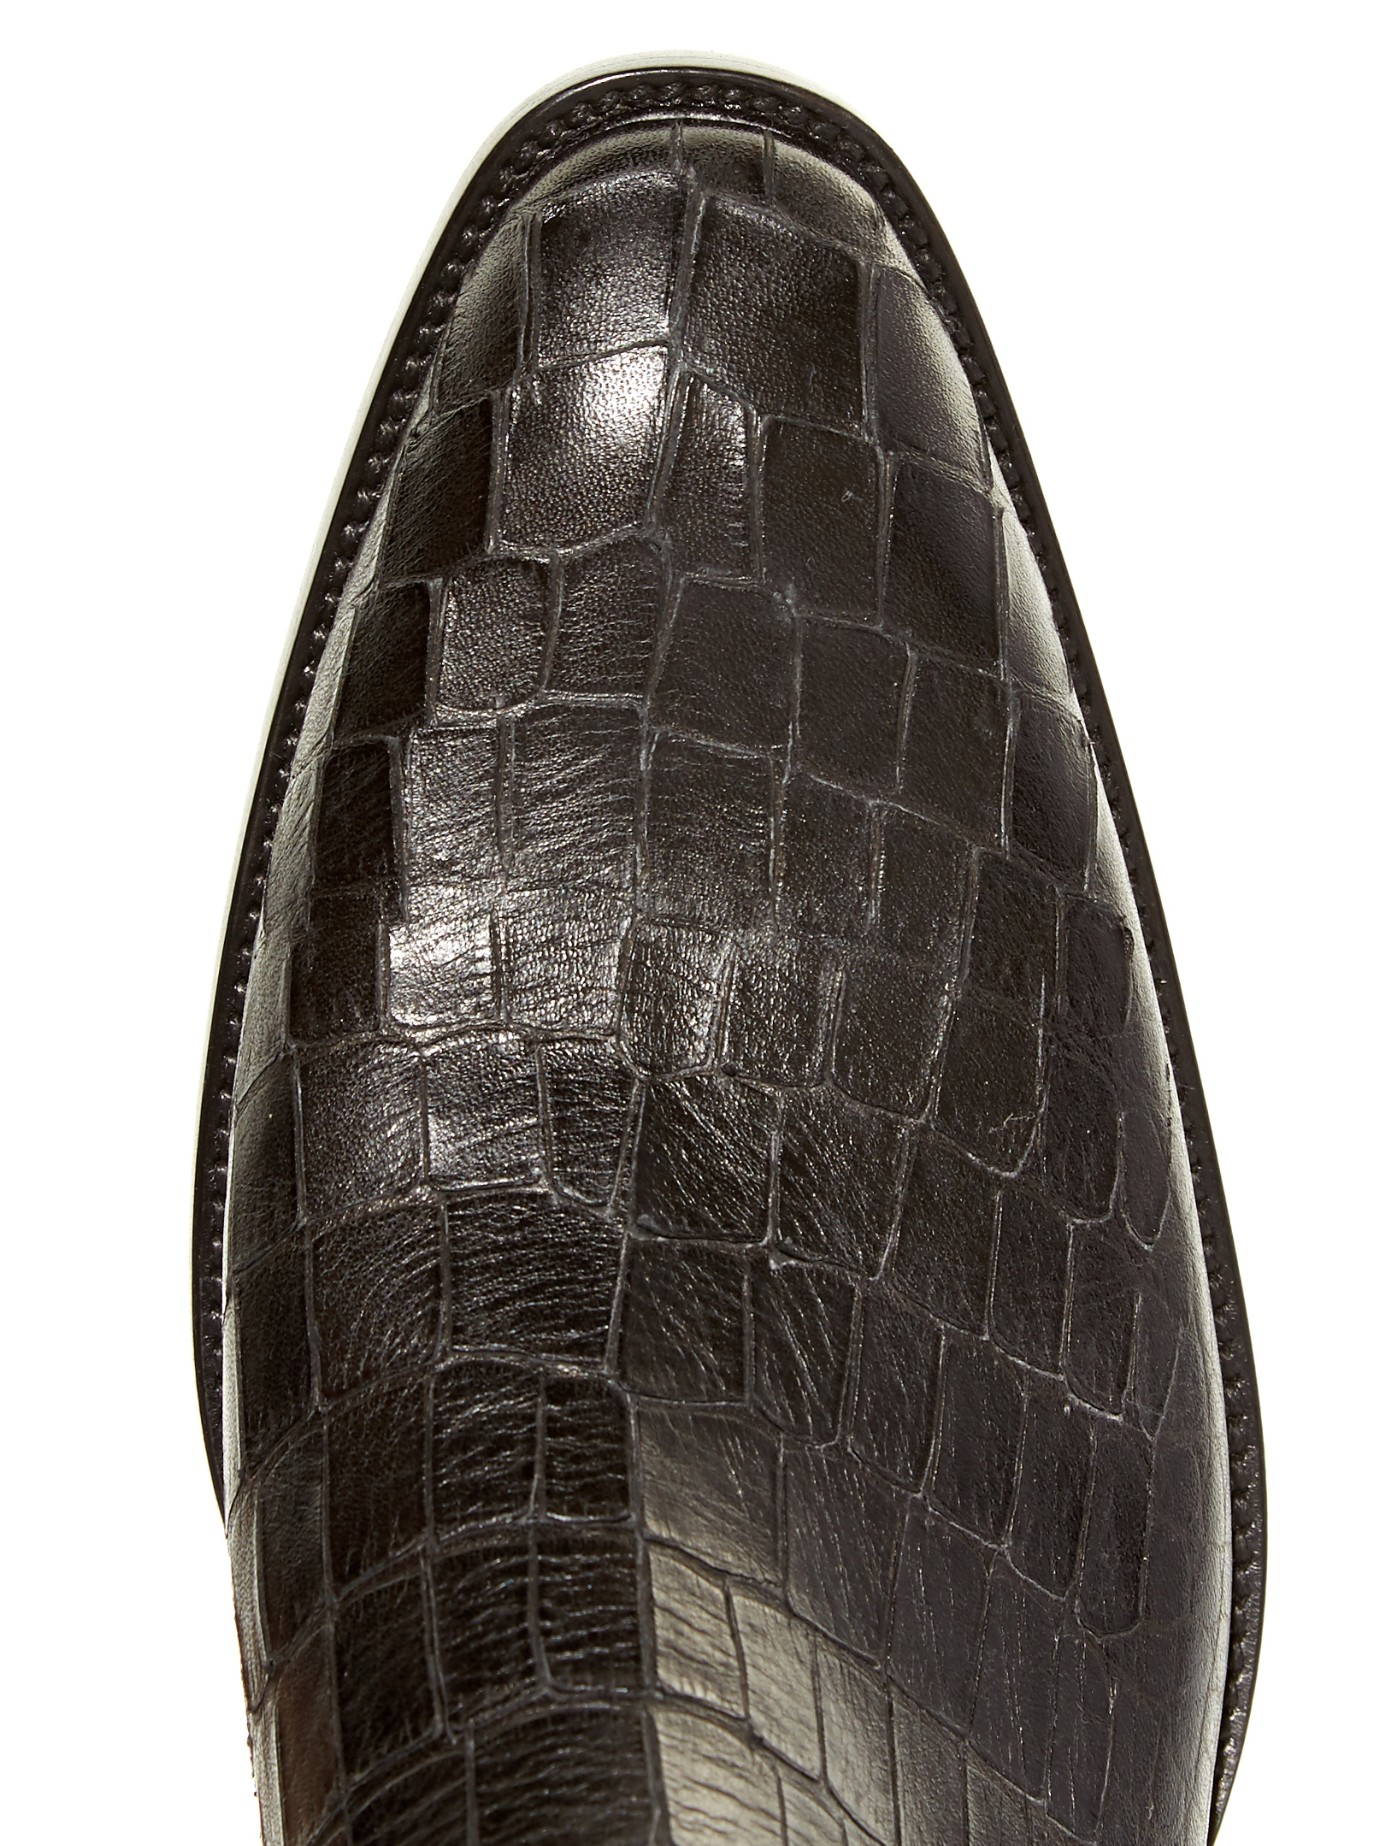 baf155e29253 Saint Laurent Crocodile-Effect Leather Chelsea Boots in Black for ...